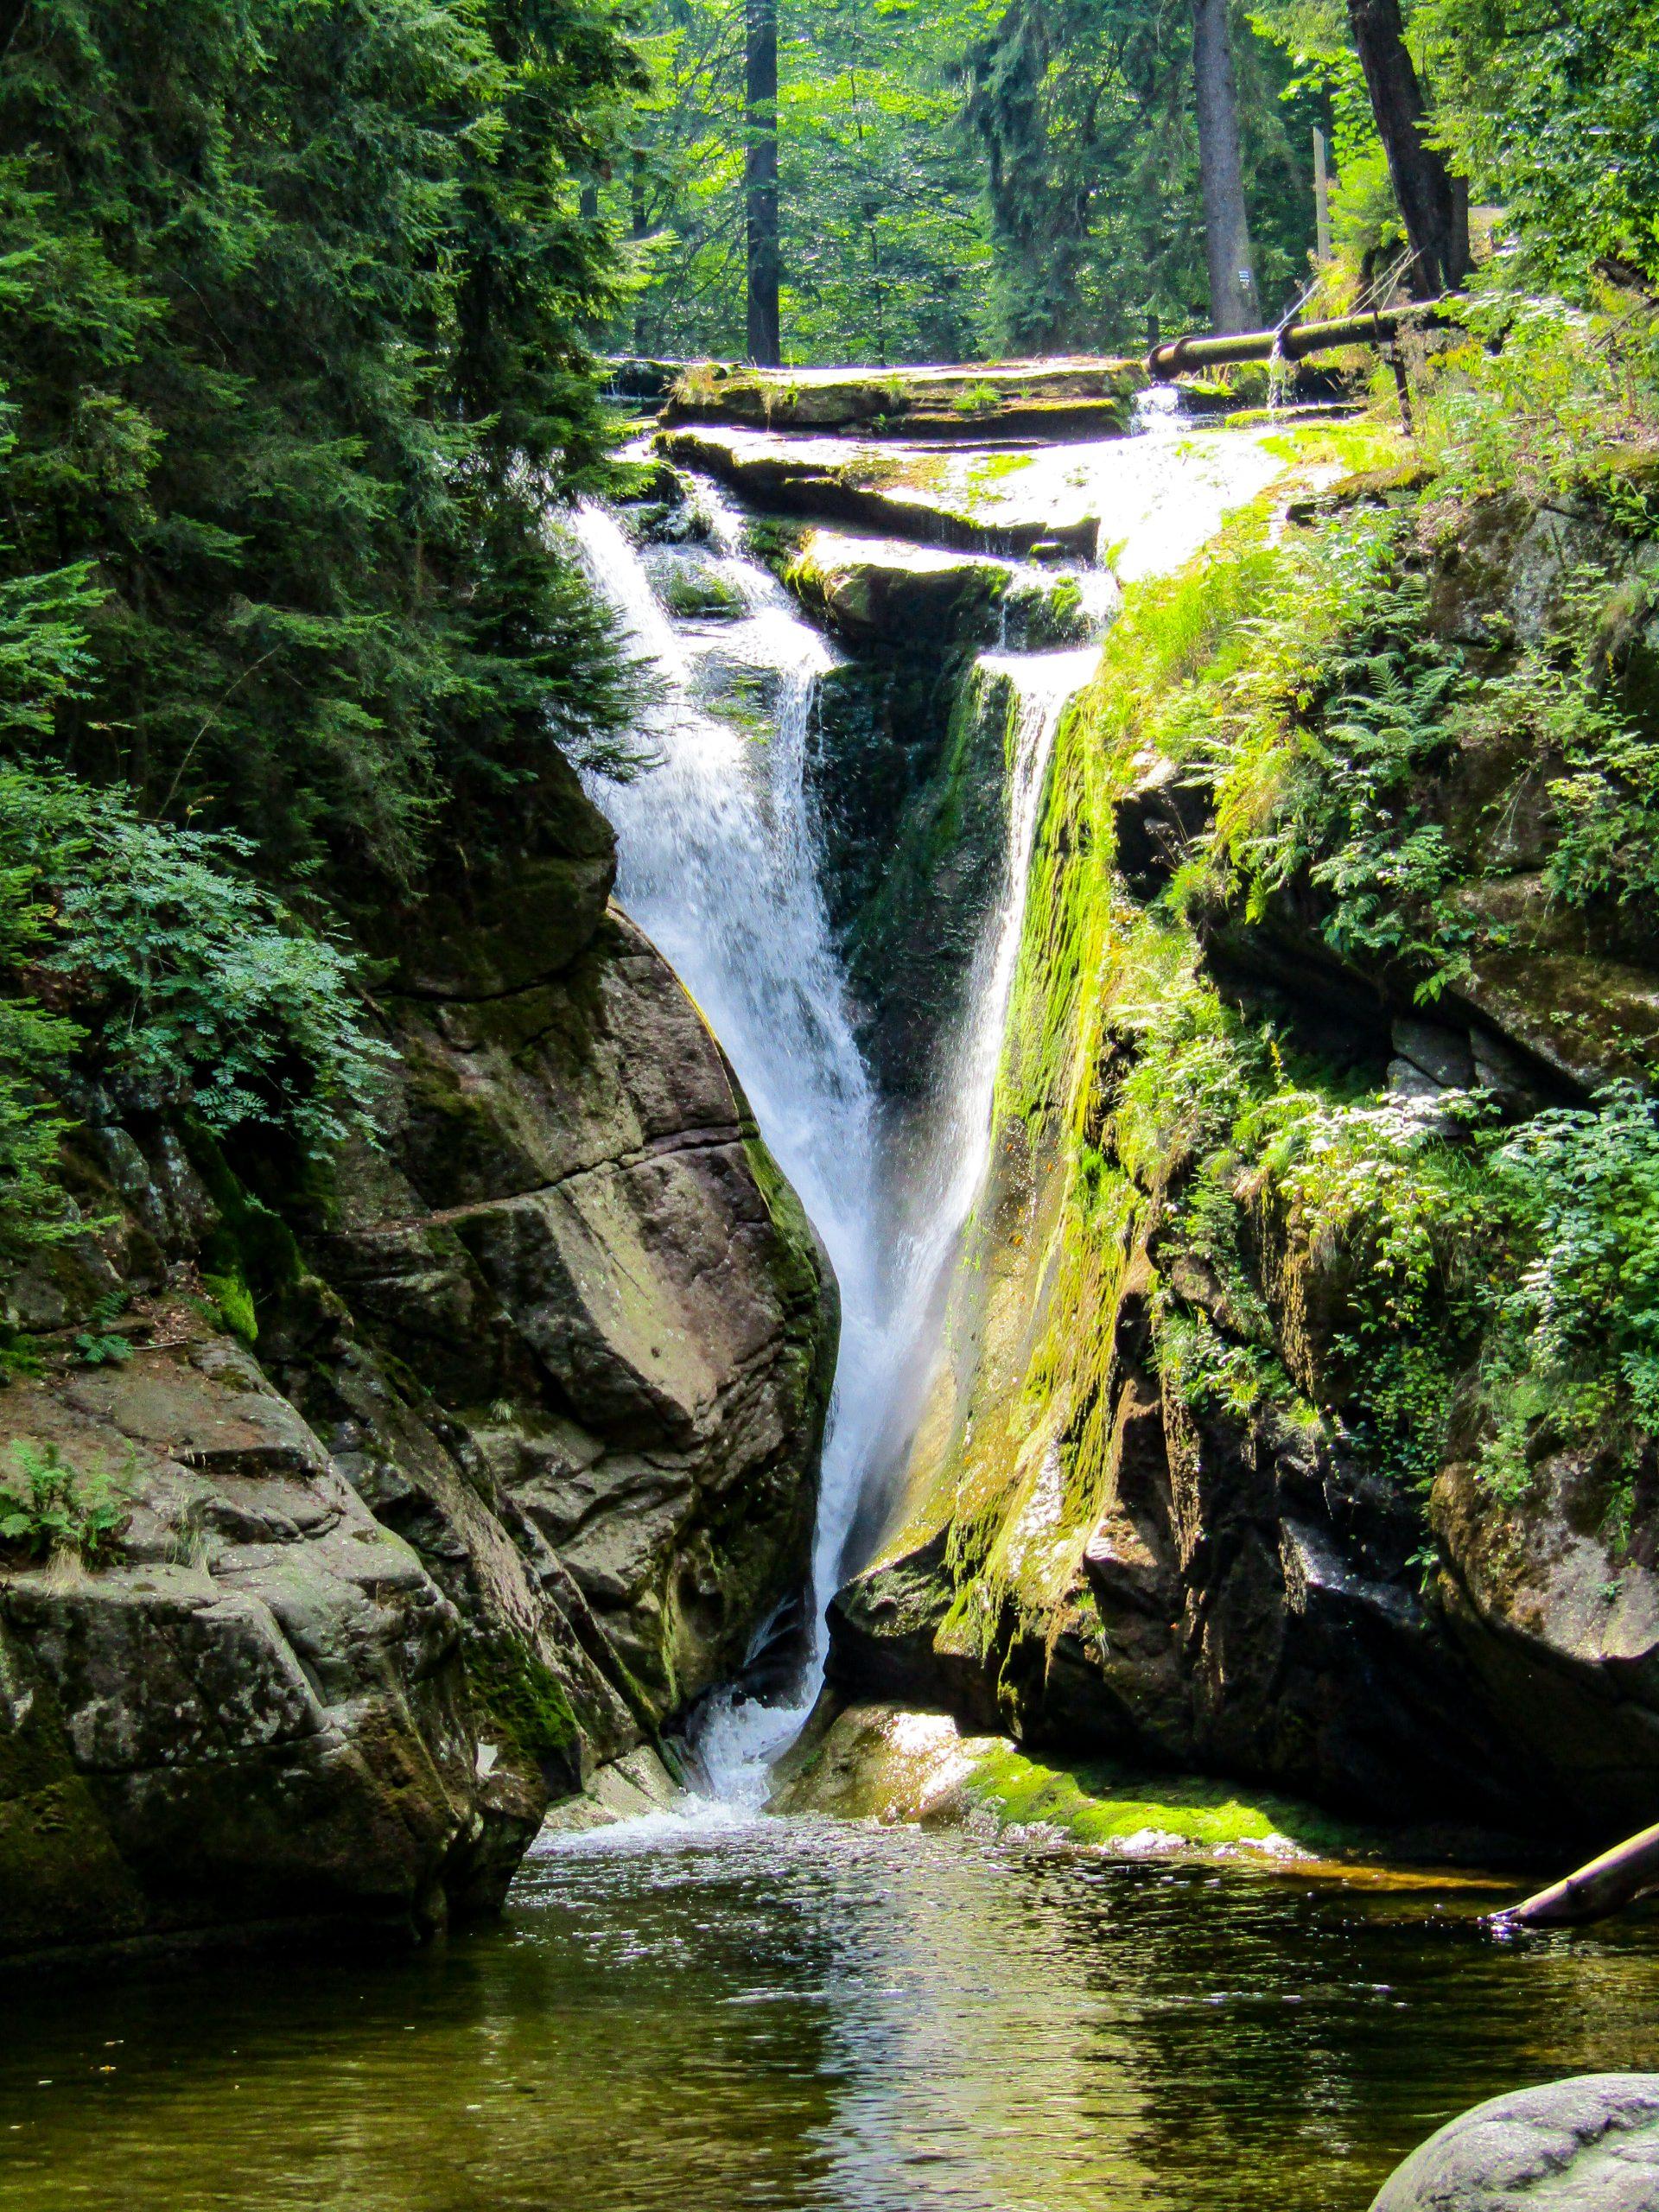 Cascading Waters of Szklarki Waterfall, Szklarska Poreba, Poland